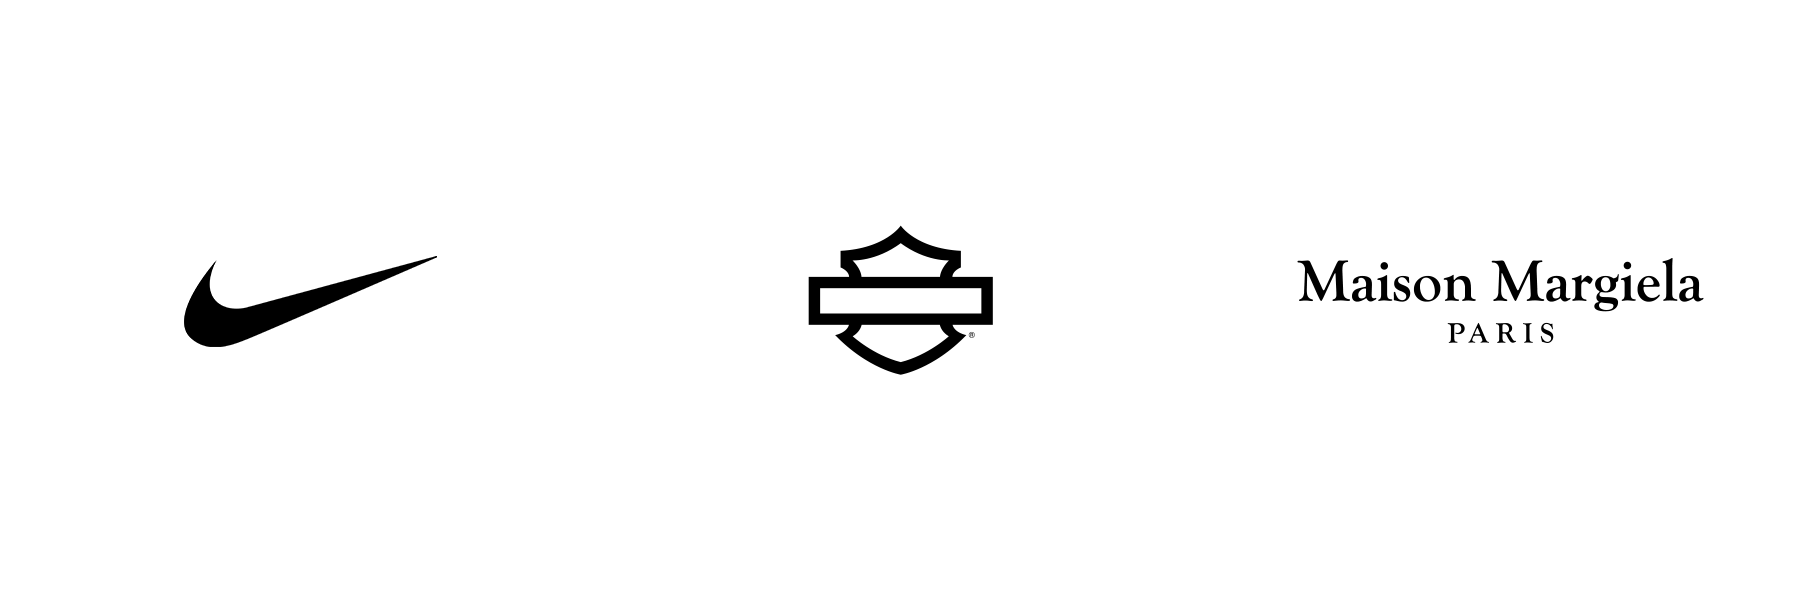 01_SunsetStudios_Logos_01B